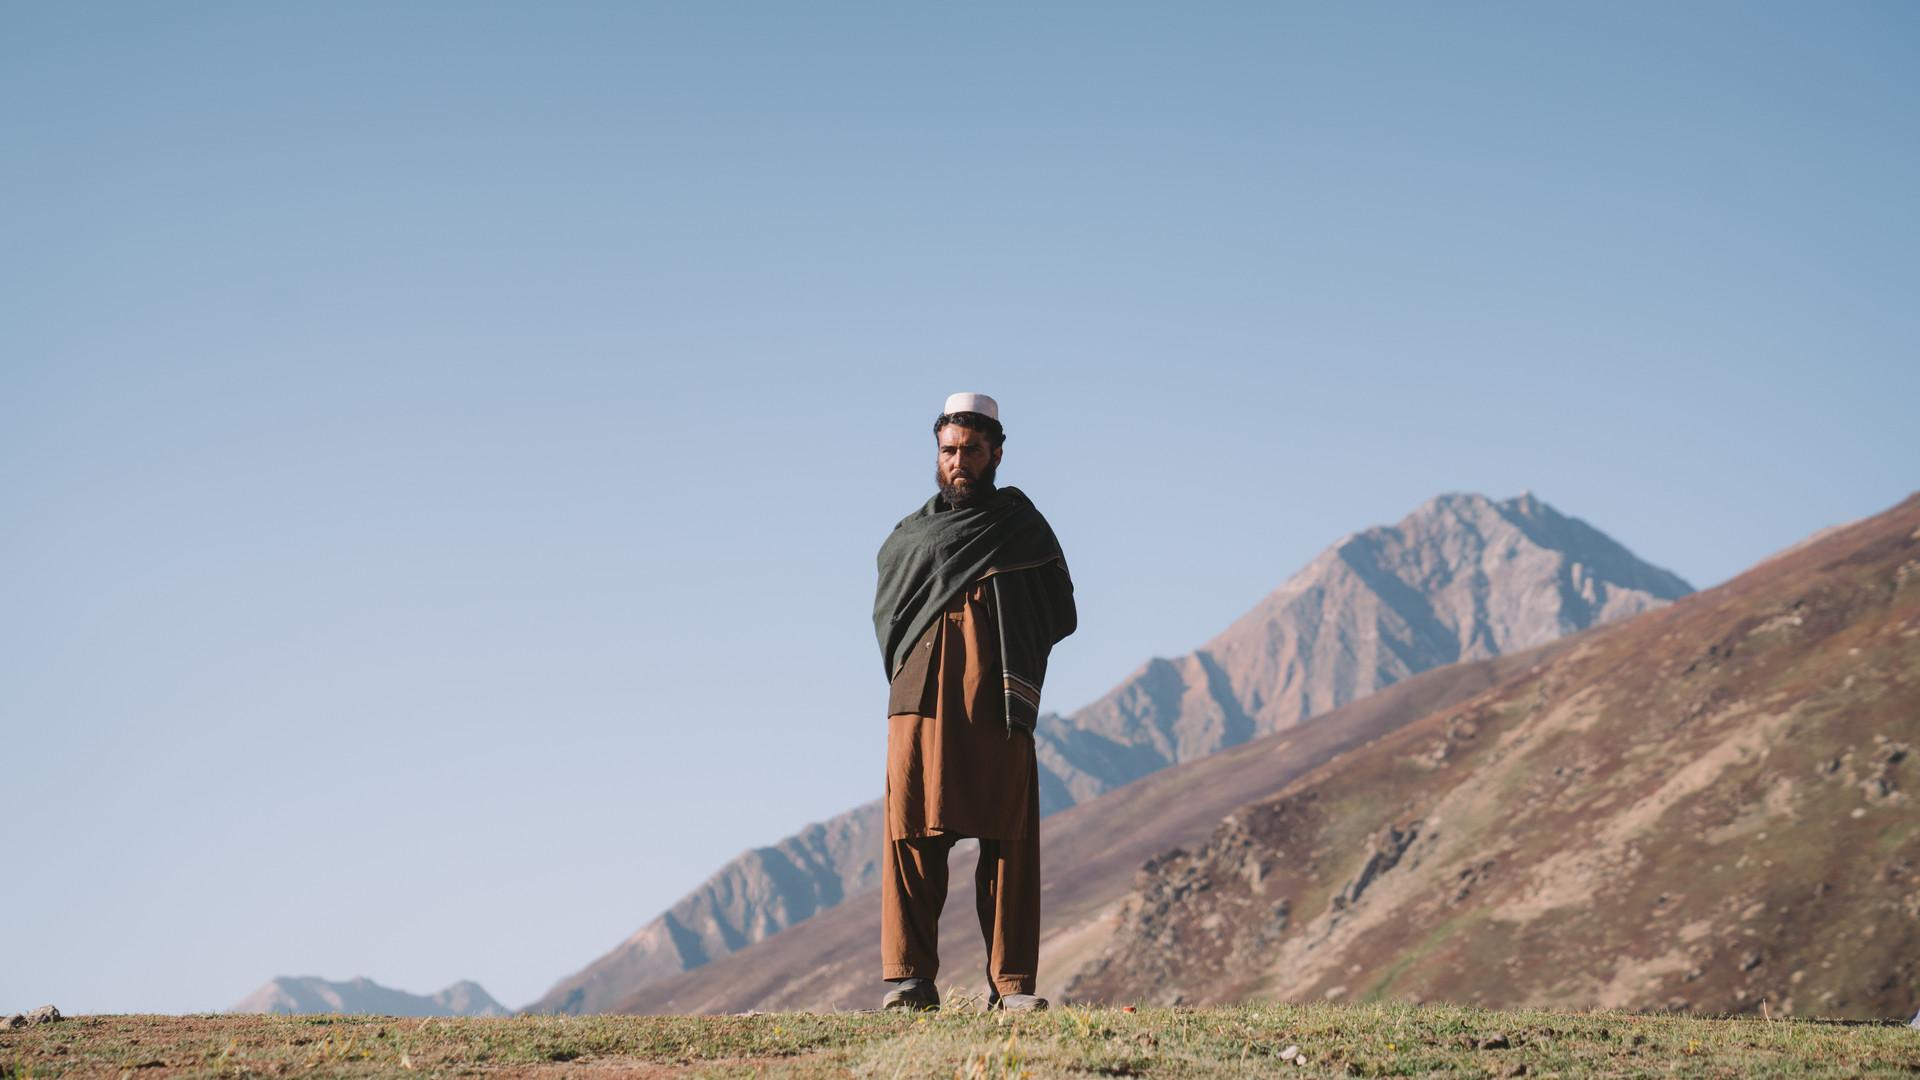 Pakistan-05580.jpg